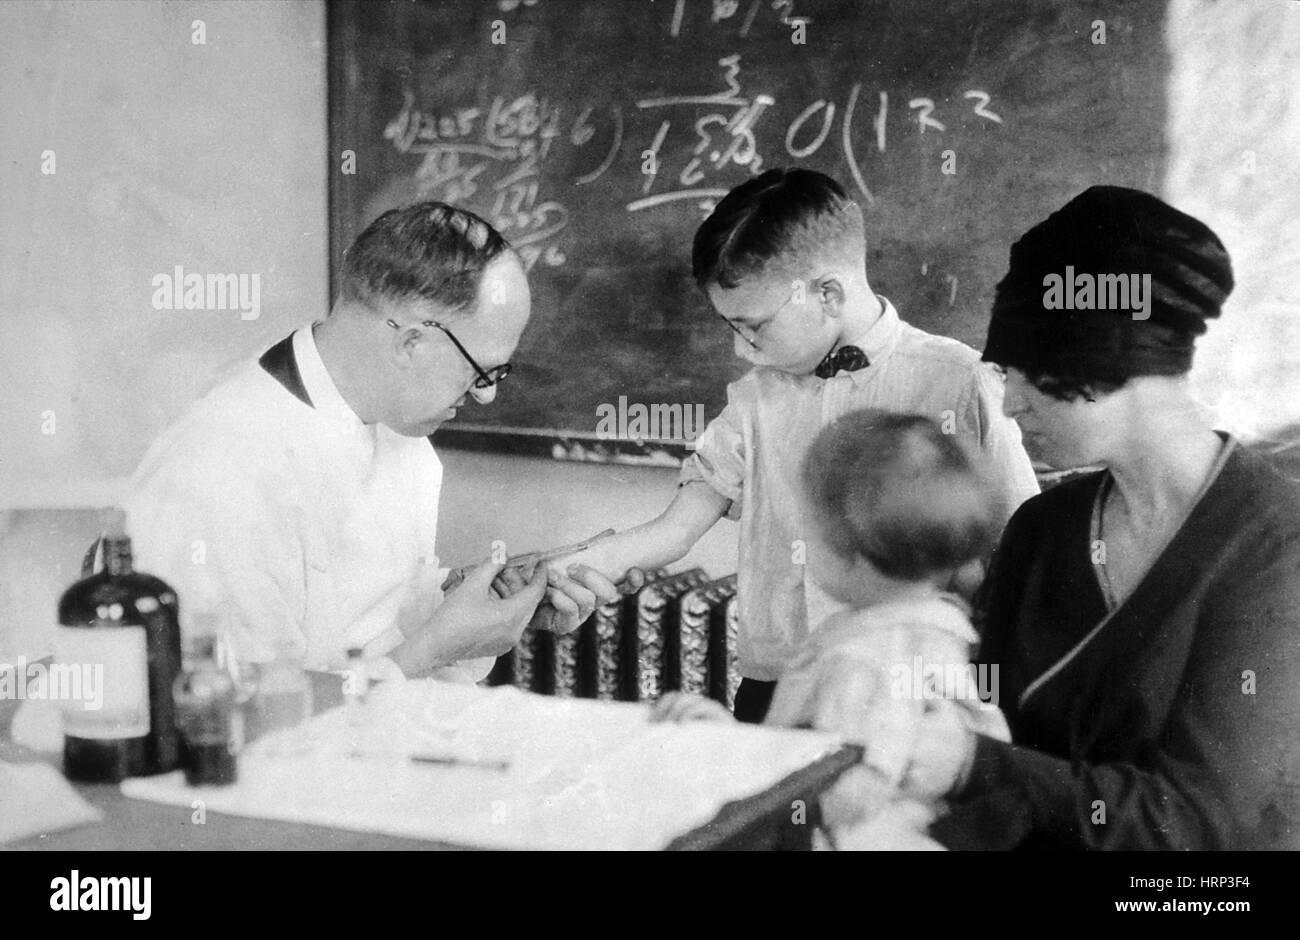 Schick Test, 1915 - Stock Image